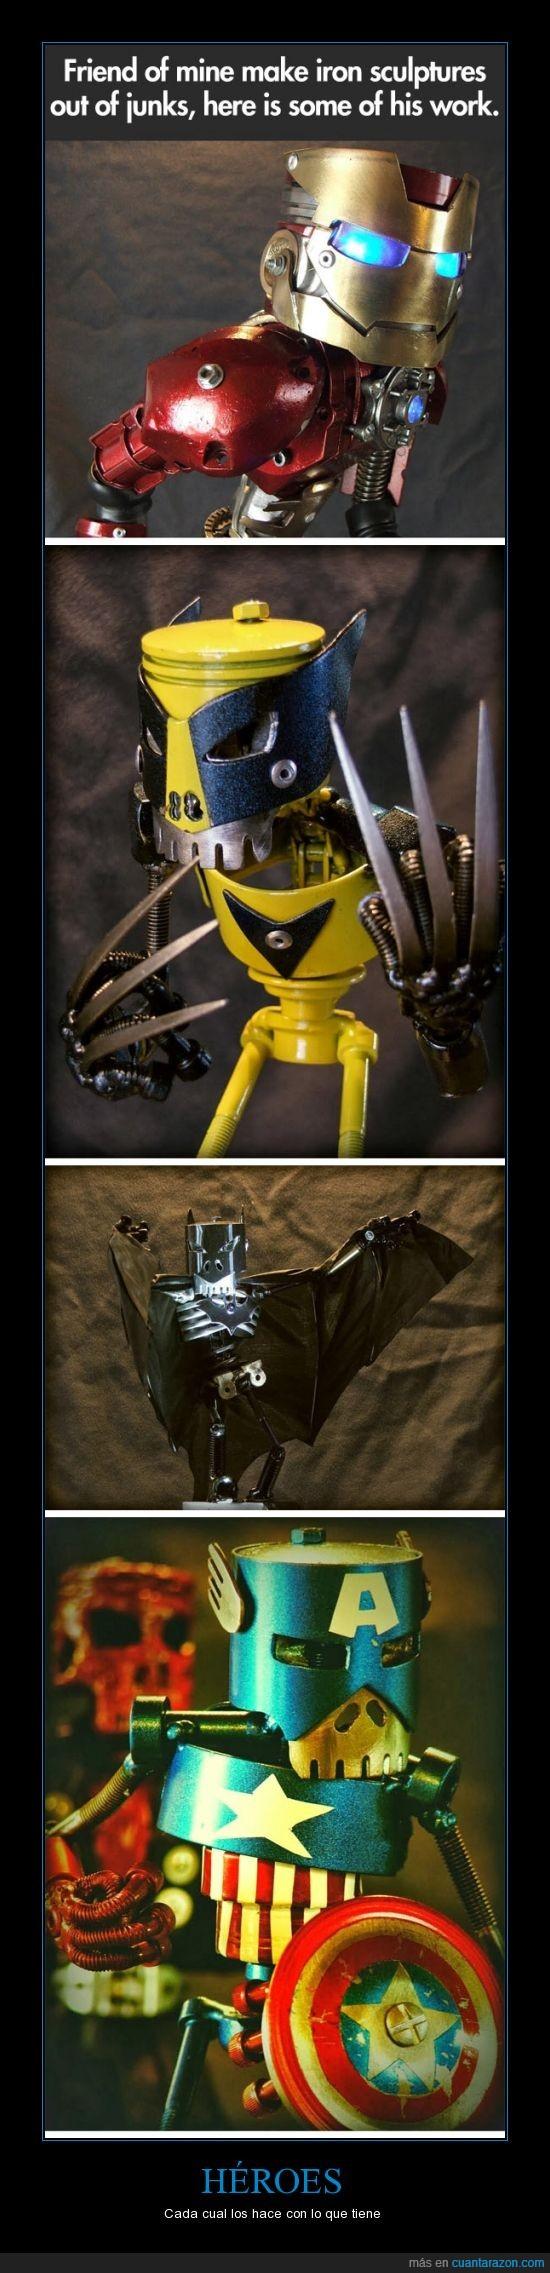 heroes,reciclaje,robots